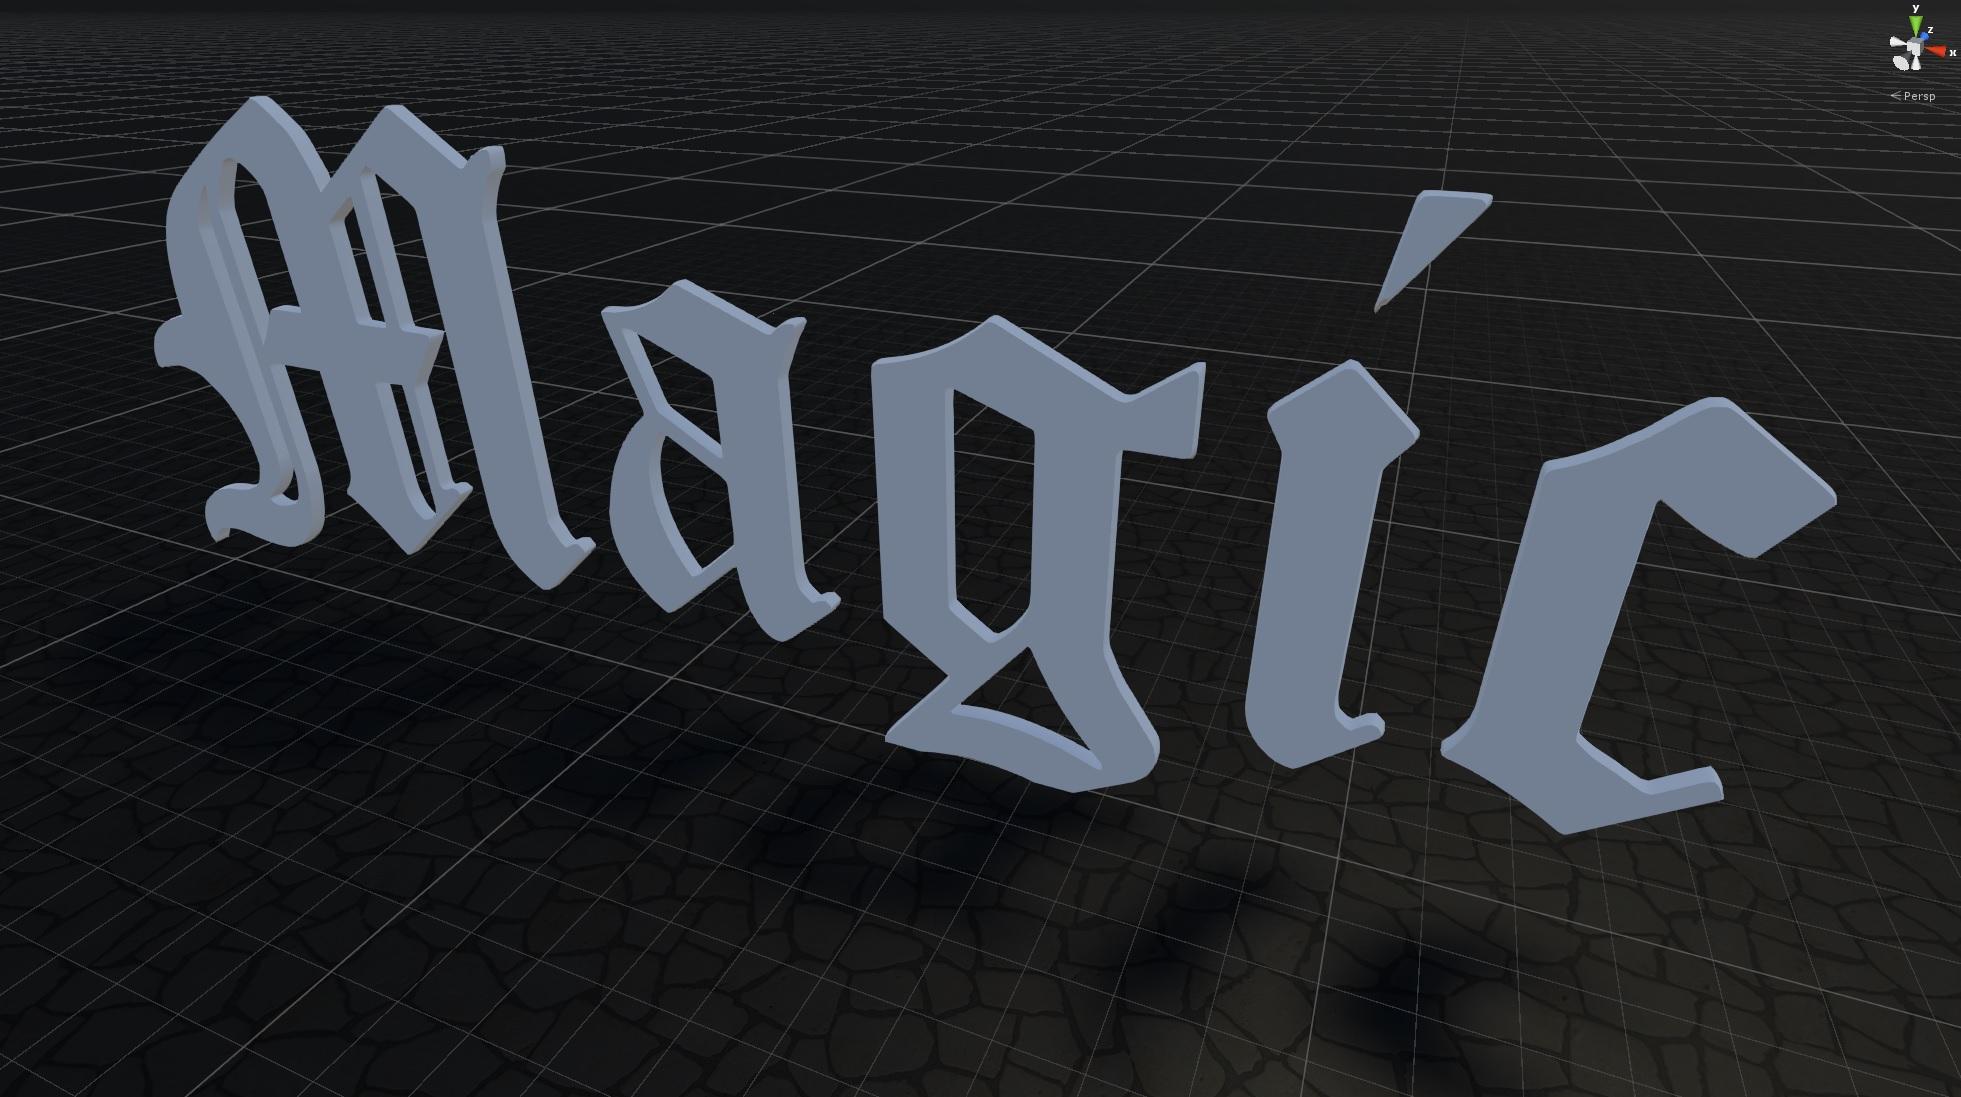 magic3b.jpg